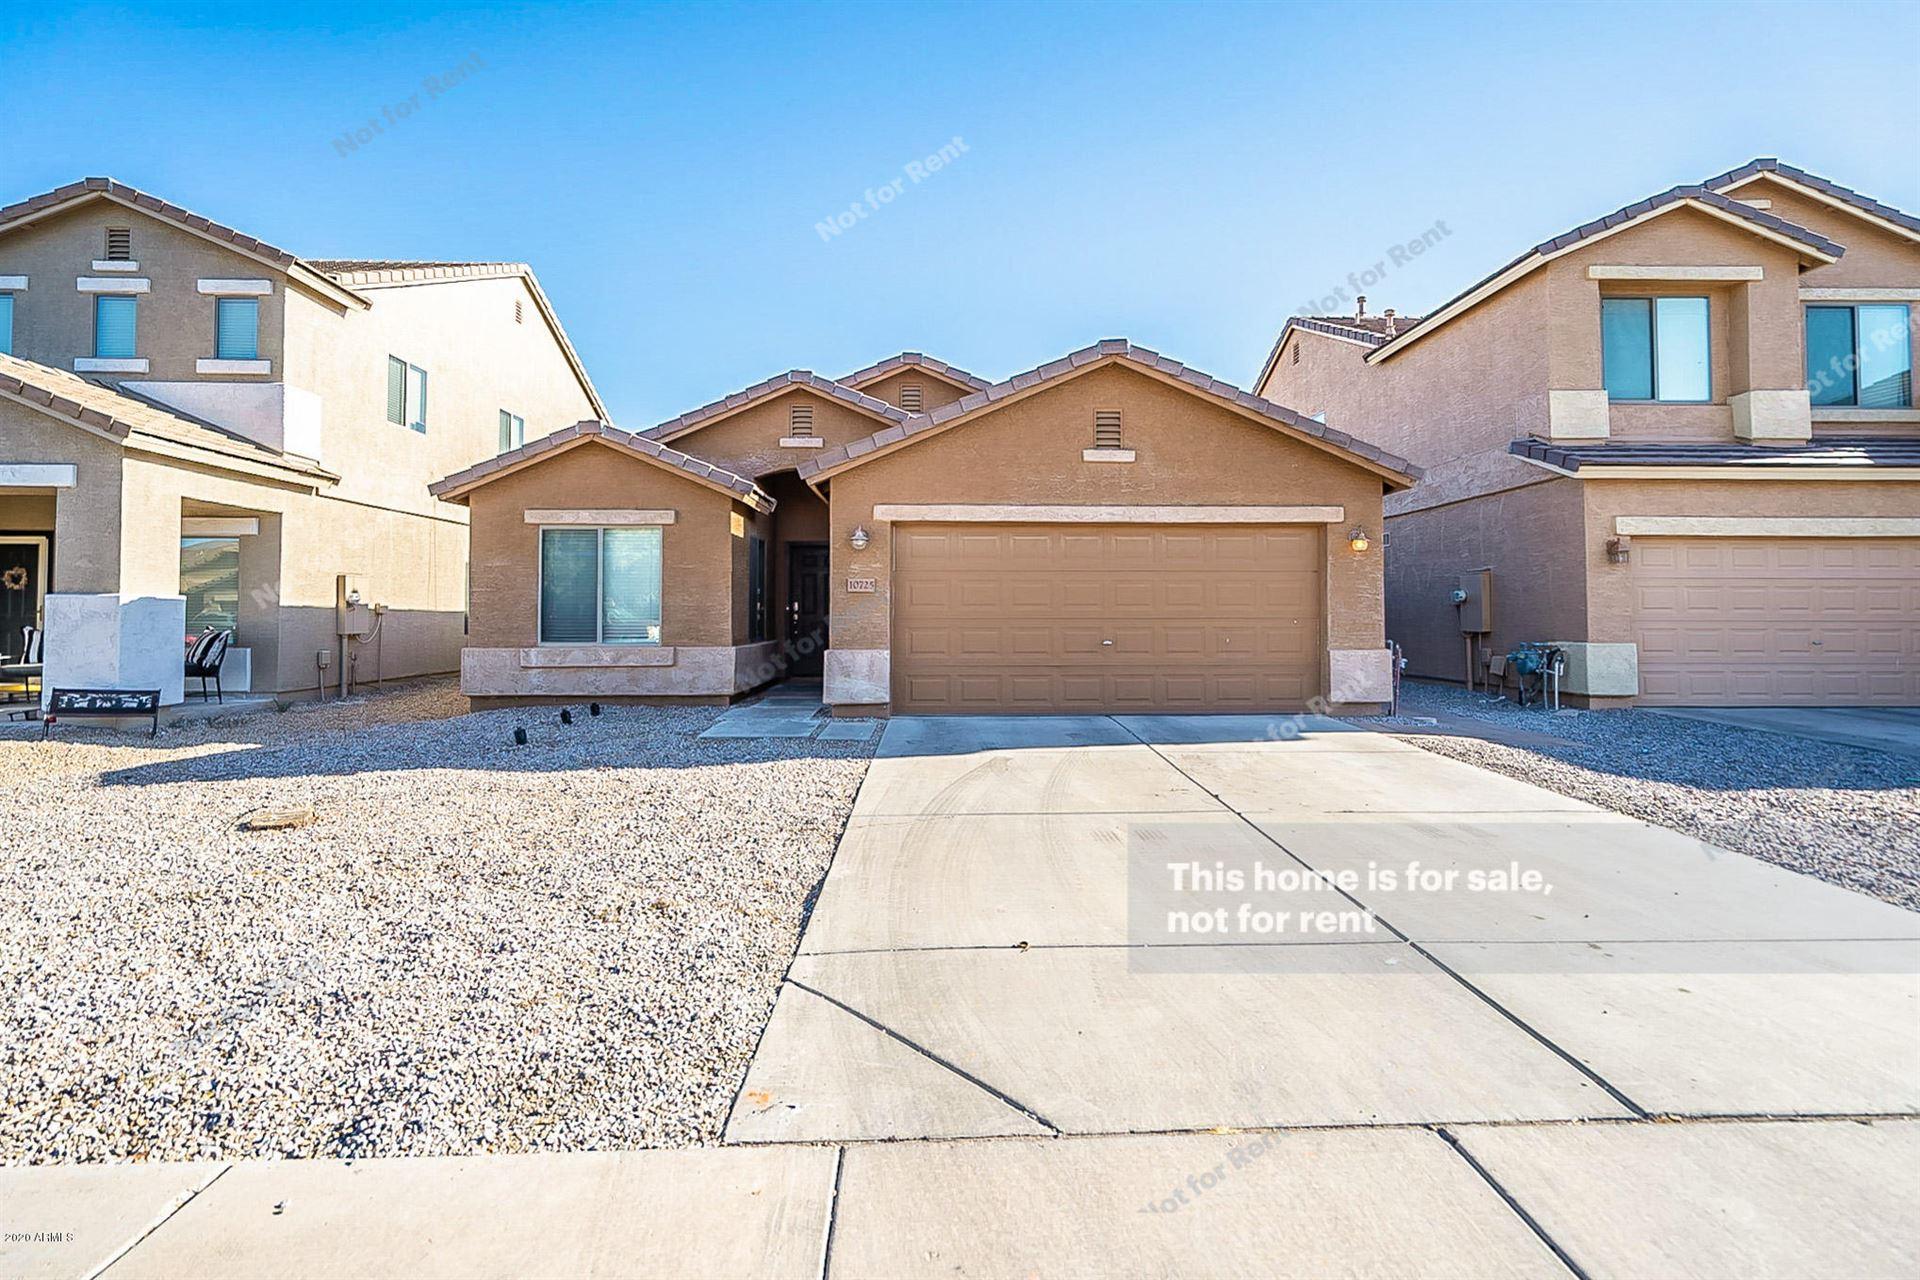 10725 E WALLFLOWER Lane, Florence, AZ 85132 - #: 6100480